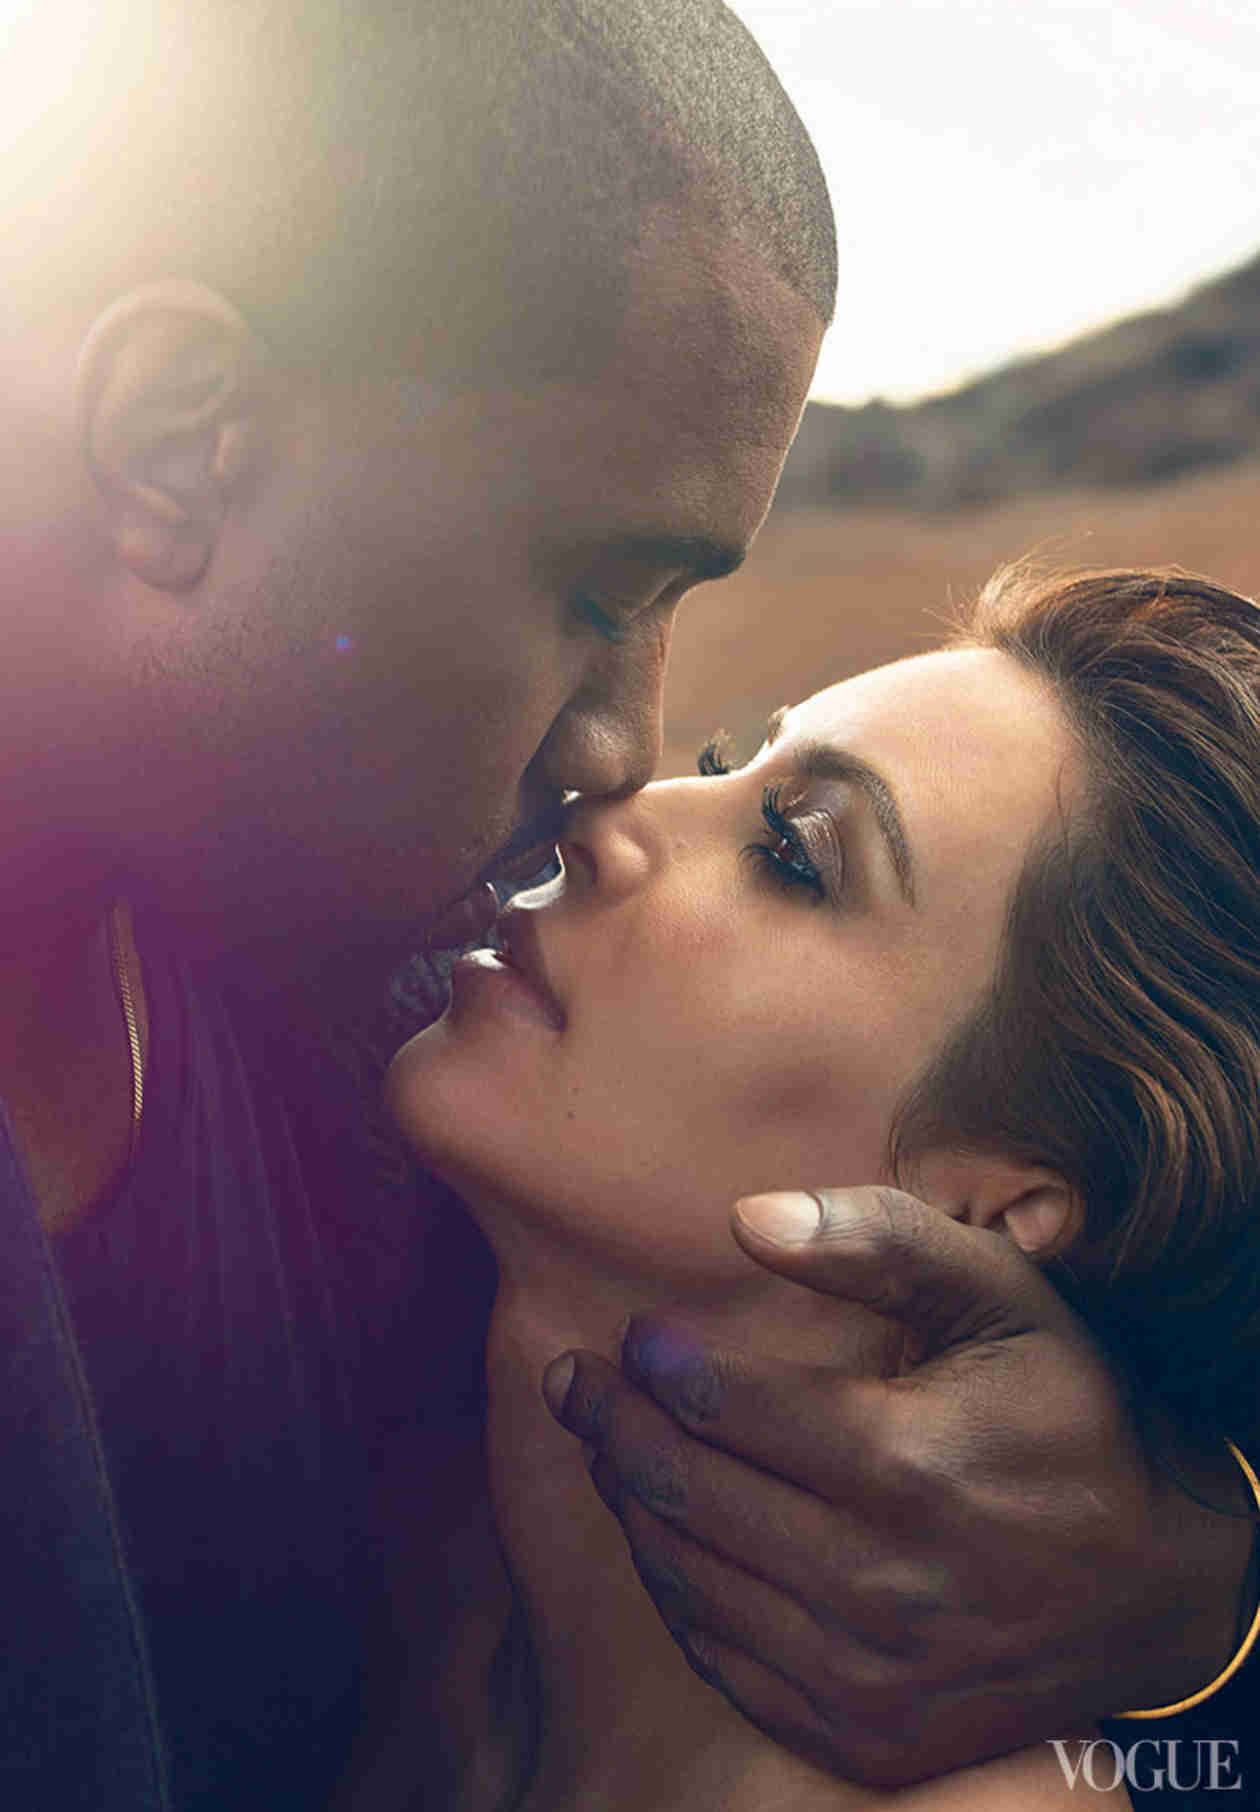 Has Kim Kardashian and Kanye West's Wedding Been Postponed? (VIDEO)